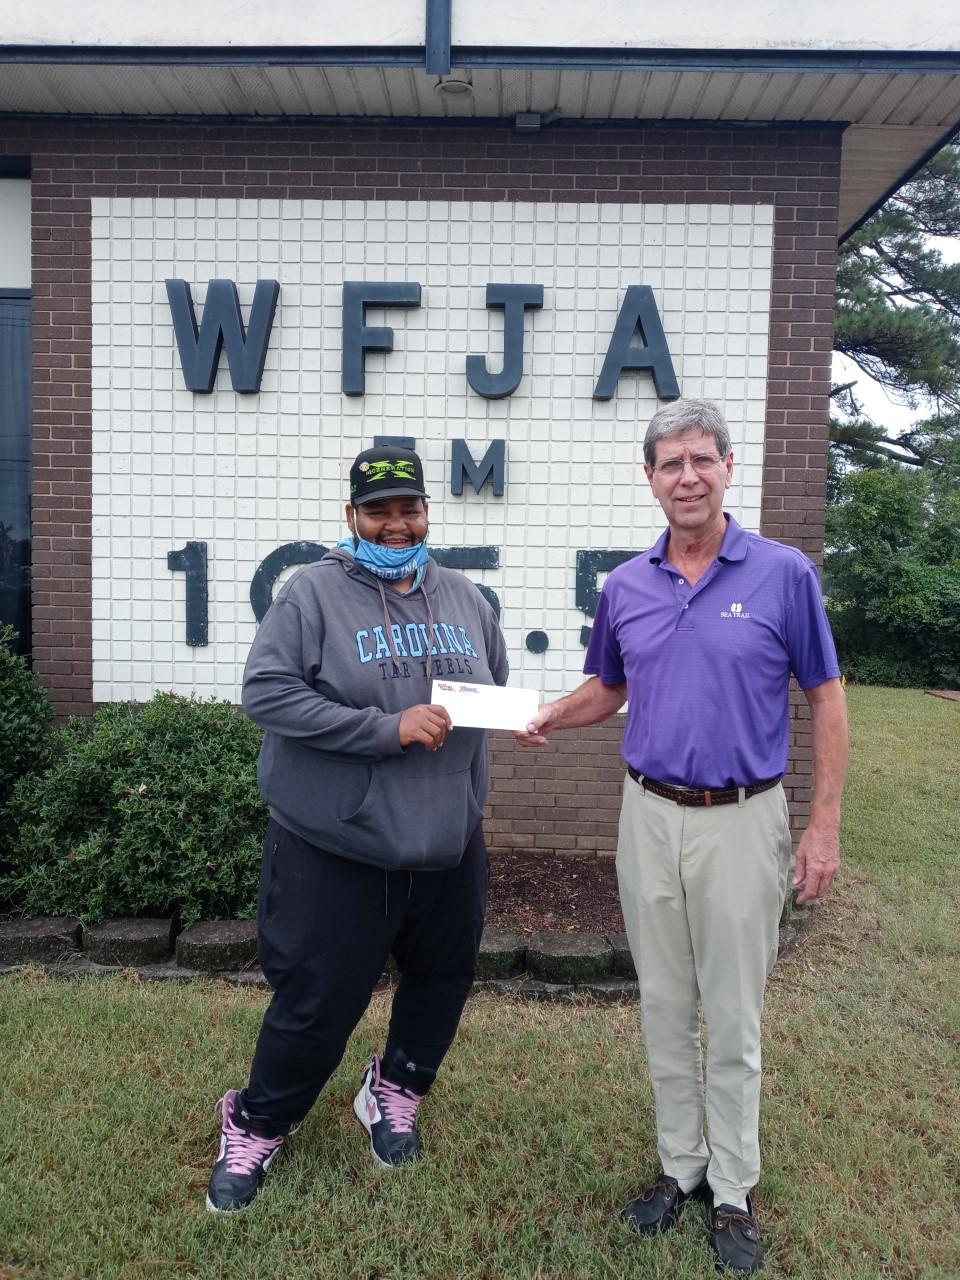 Jon Hockaday, CEO of Sandhills Broadcasting handing prize money to Sanford, North Carolina local, Michael Freeman. Michael Freeman was the 2021 winner of the WFJA Summer Cash Giveaway.